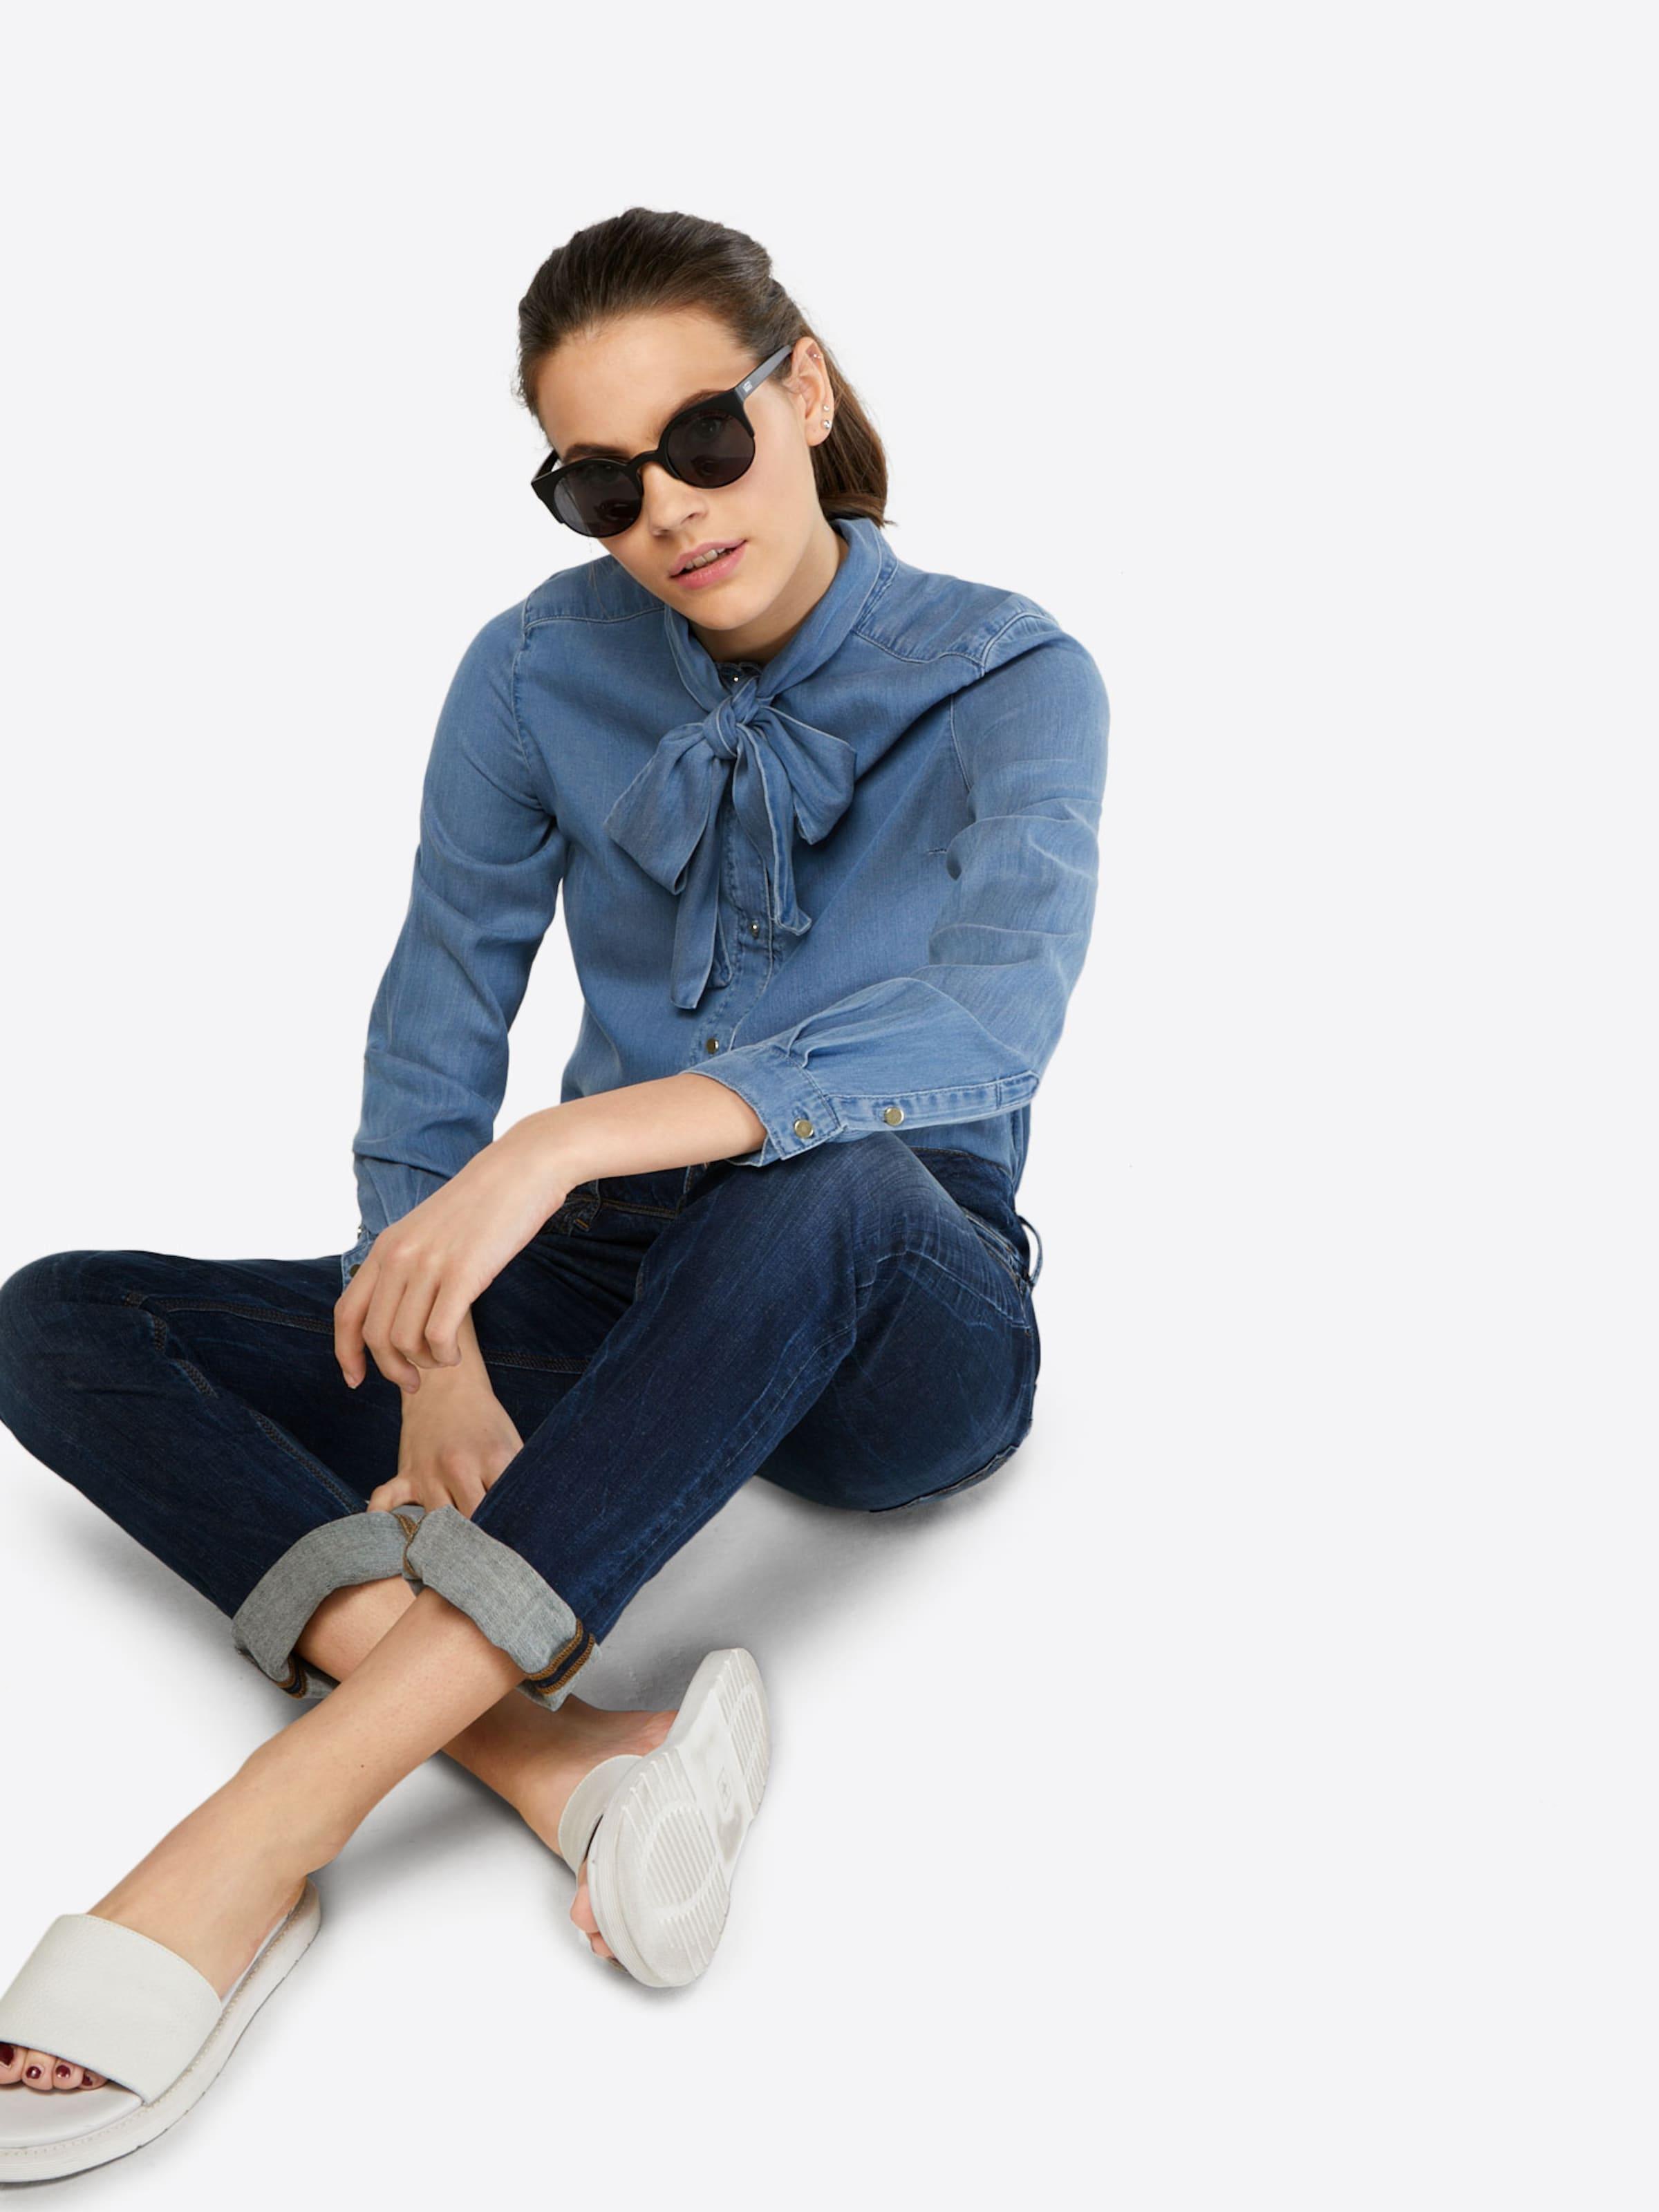 Ltb Blue 'jonquil' Jeans Denim In VGqUzMSp